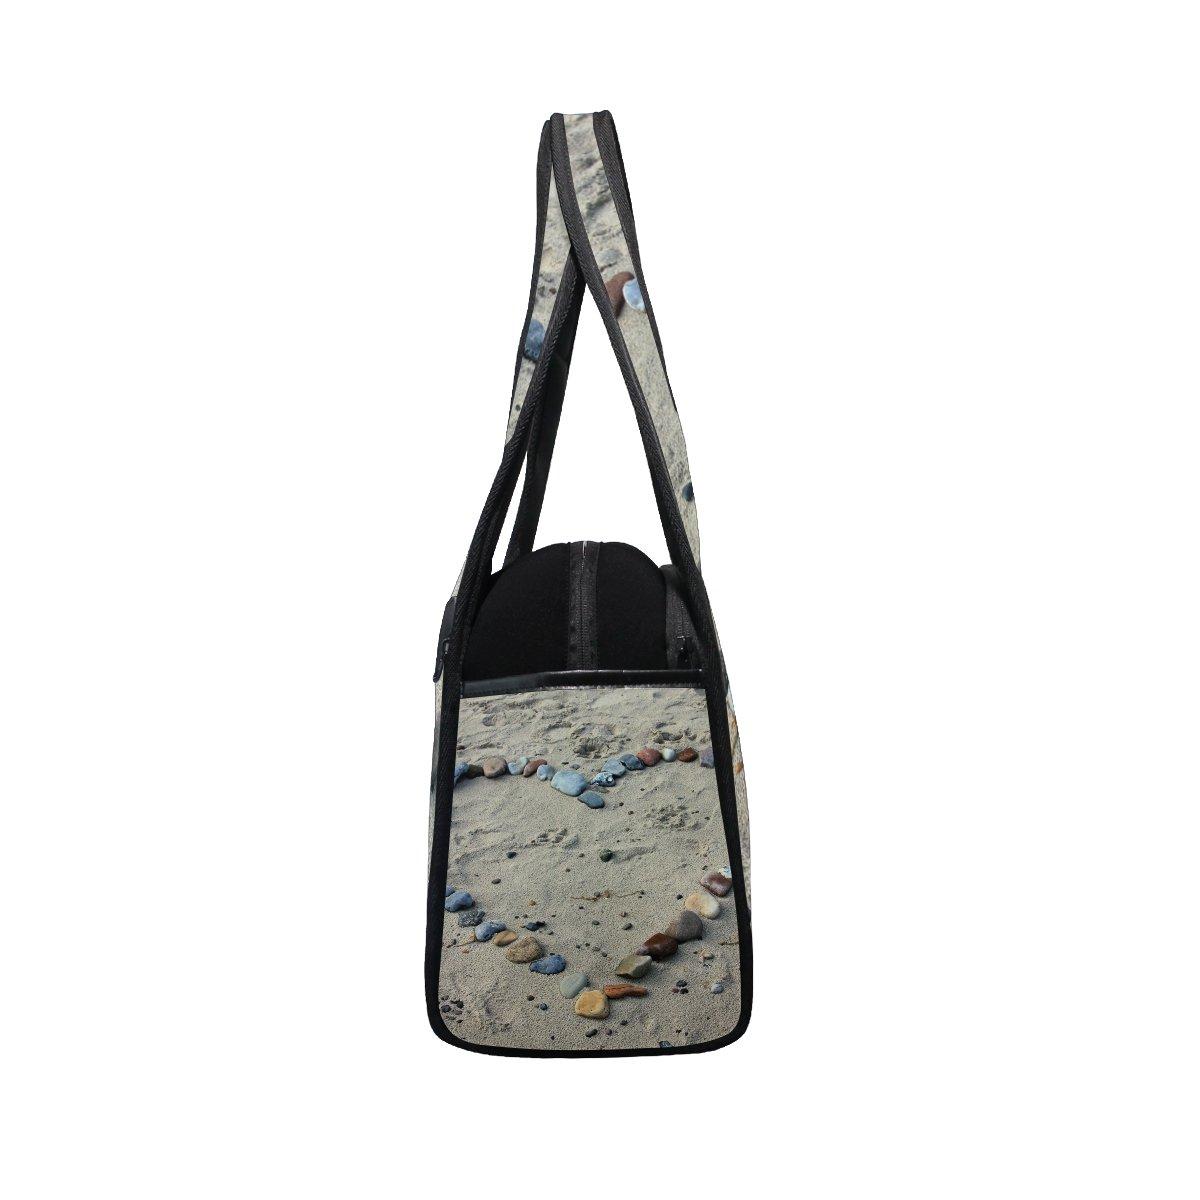 AHOMY Canvas Sports Gym Bag Beach Stone Love Travel Shoulder Bag